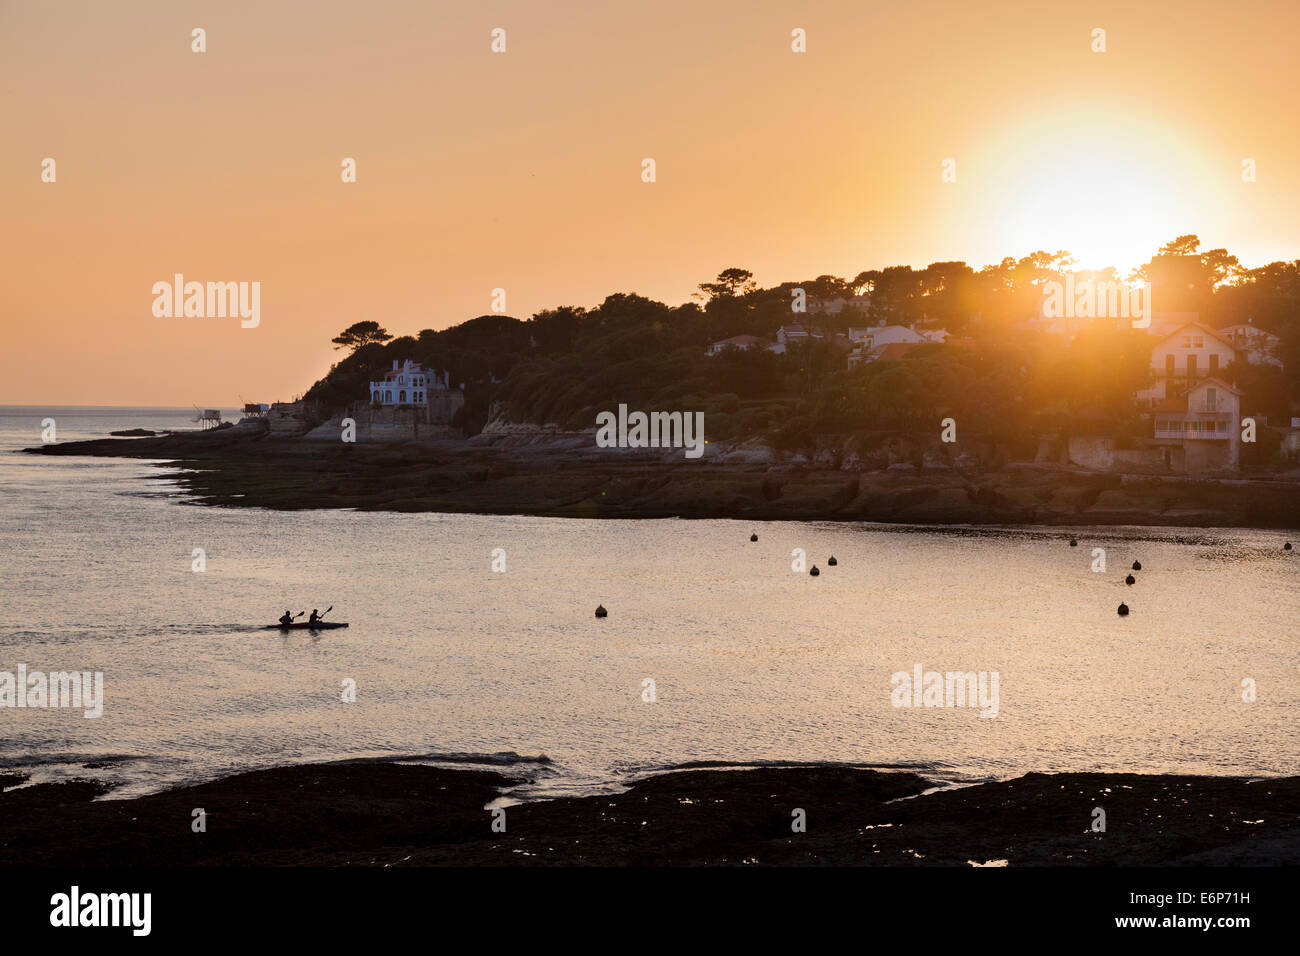 A two man canoe enters the bay at Conche de Saint Palais as the sun sets. - Stock Image